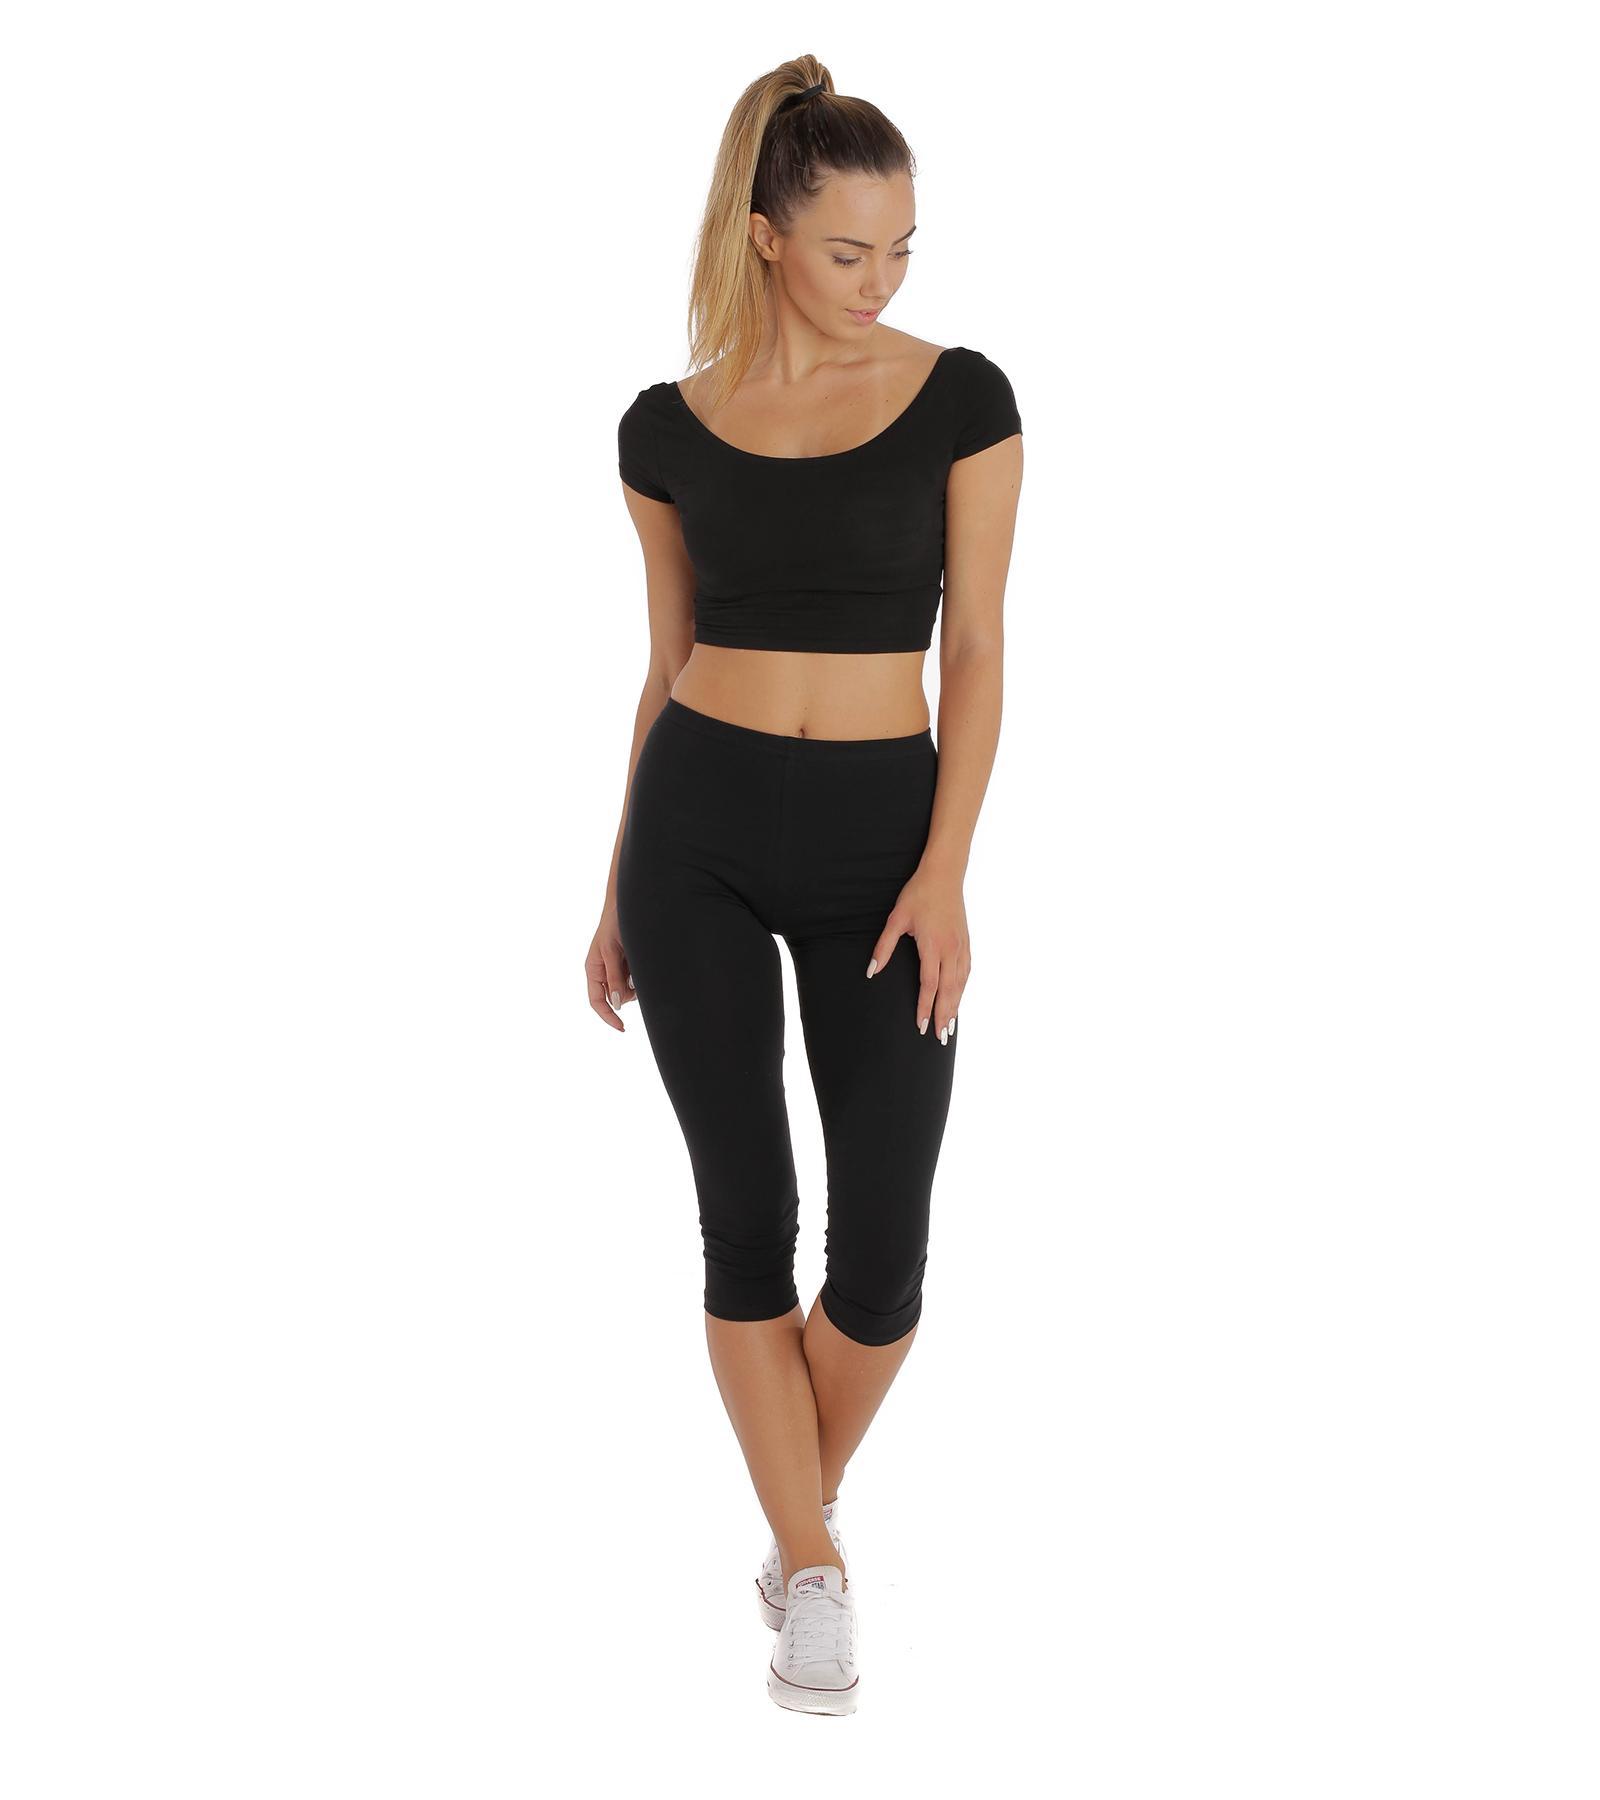 Czarne legginsy damskie do fitness BENSINI®